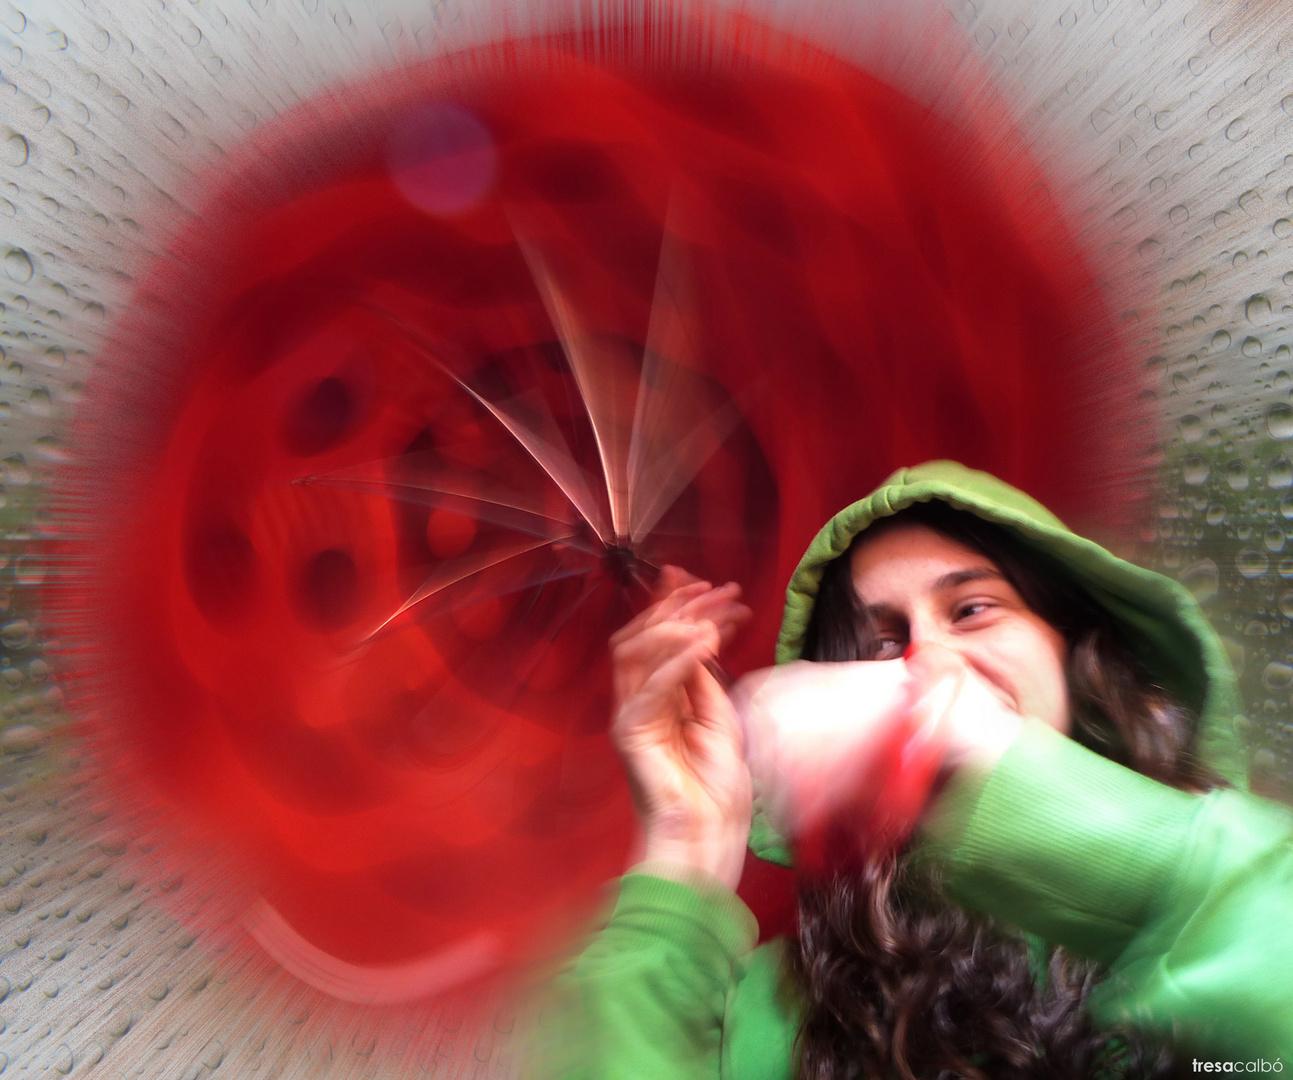 El paraguas rojo